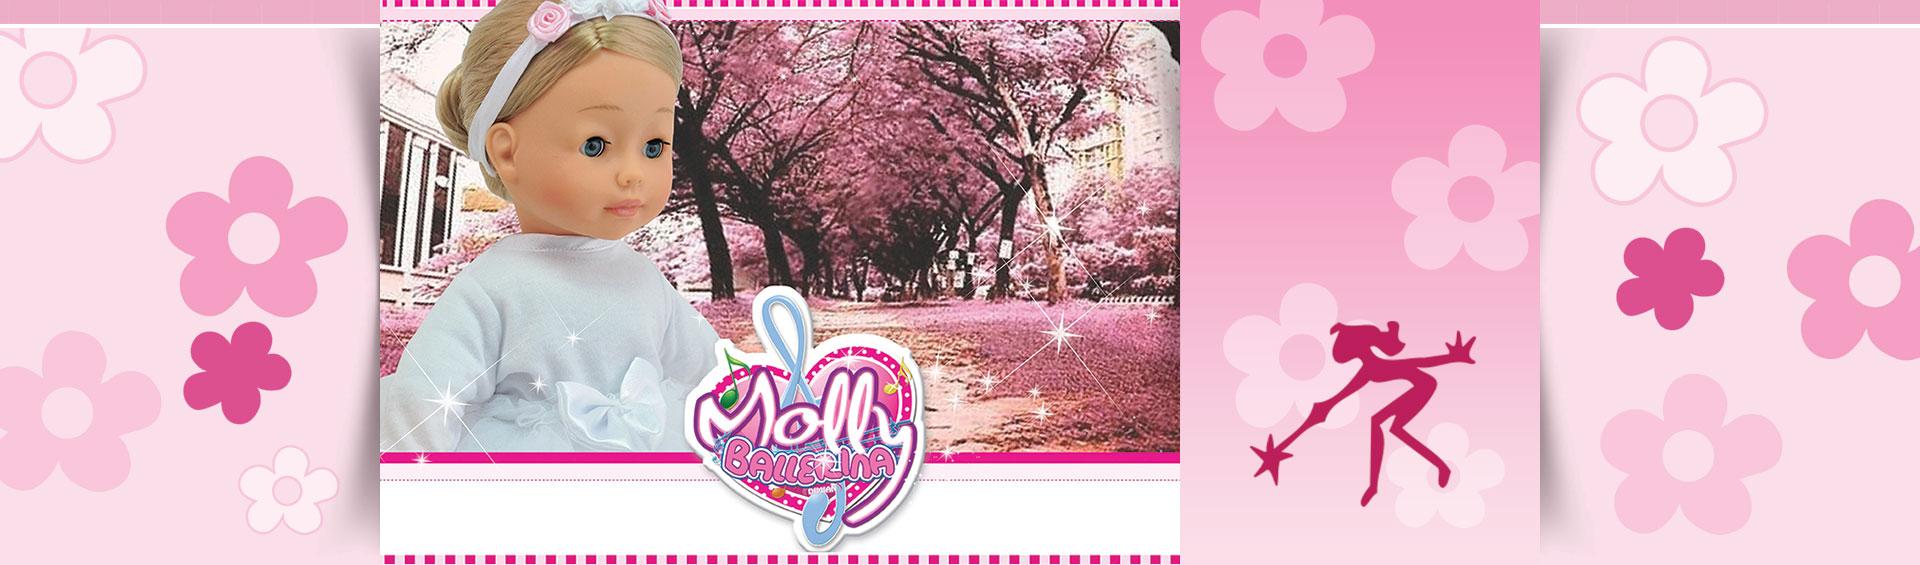 slideshow2016-molly